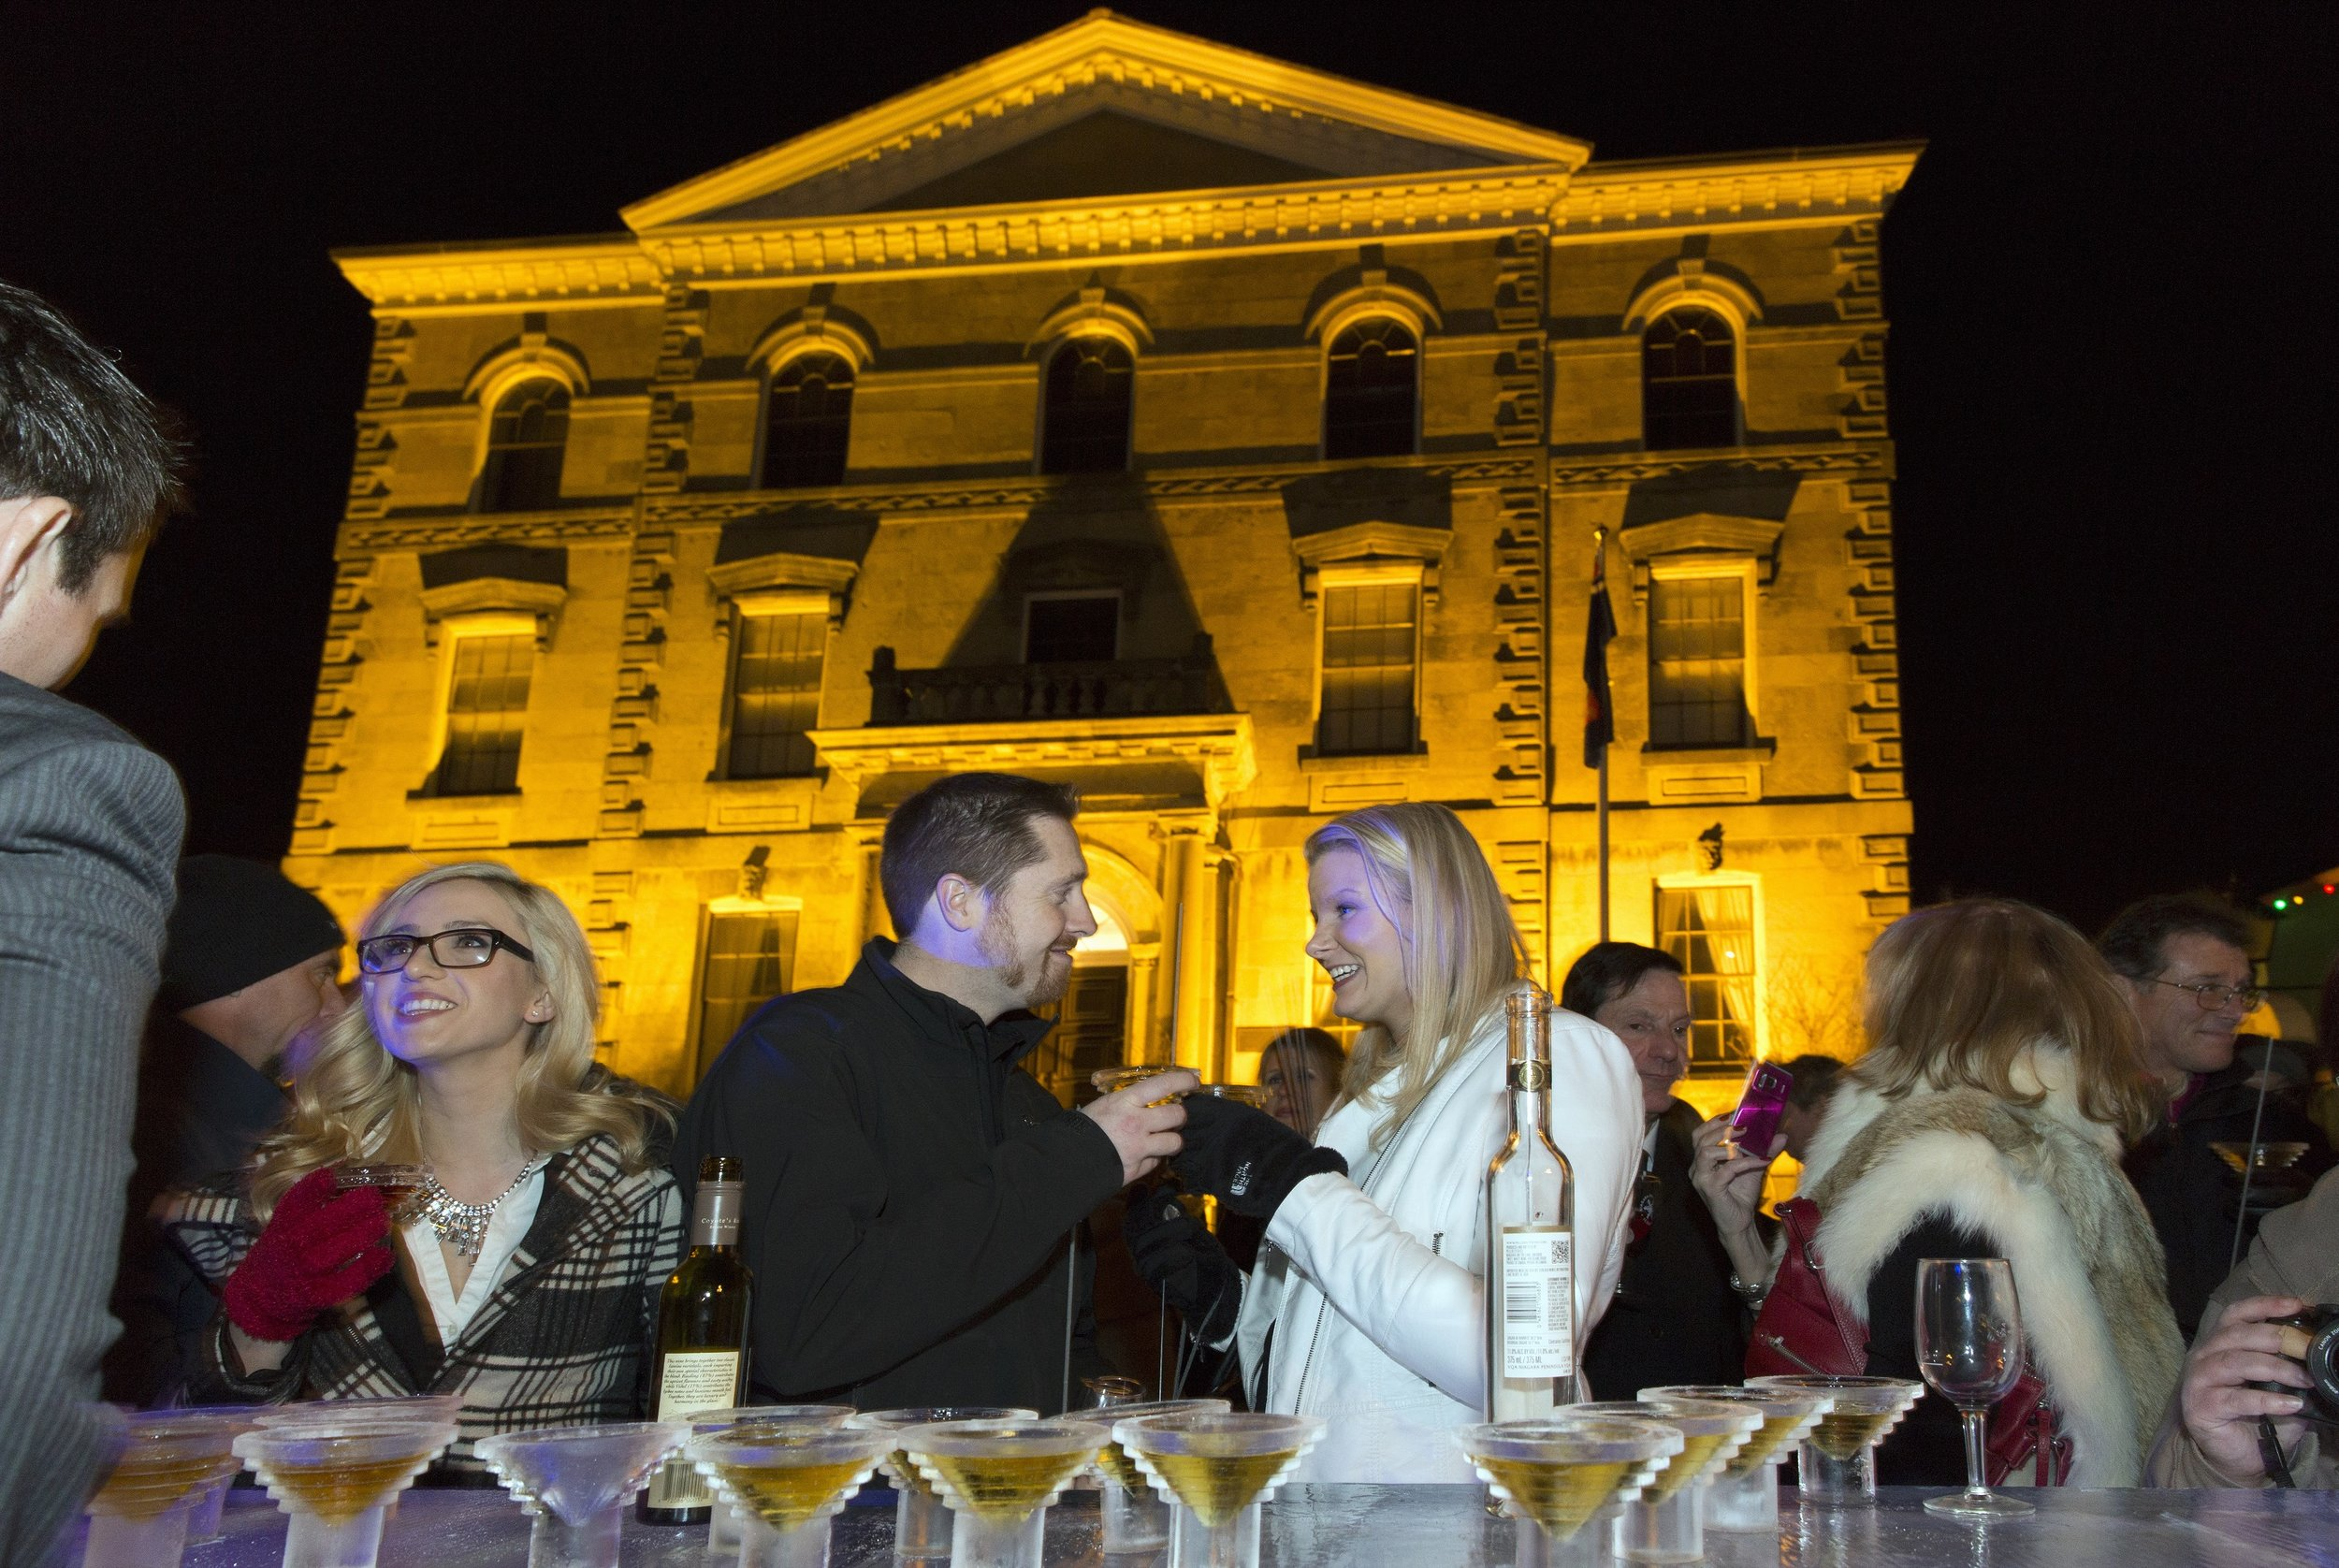 2019 Niagara Ice Wine Festival Modern Mississauga Media 3.jpg